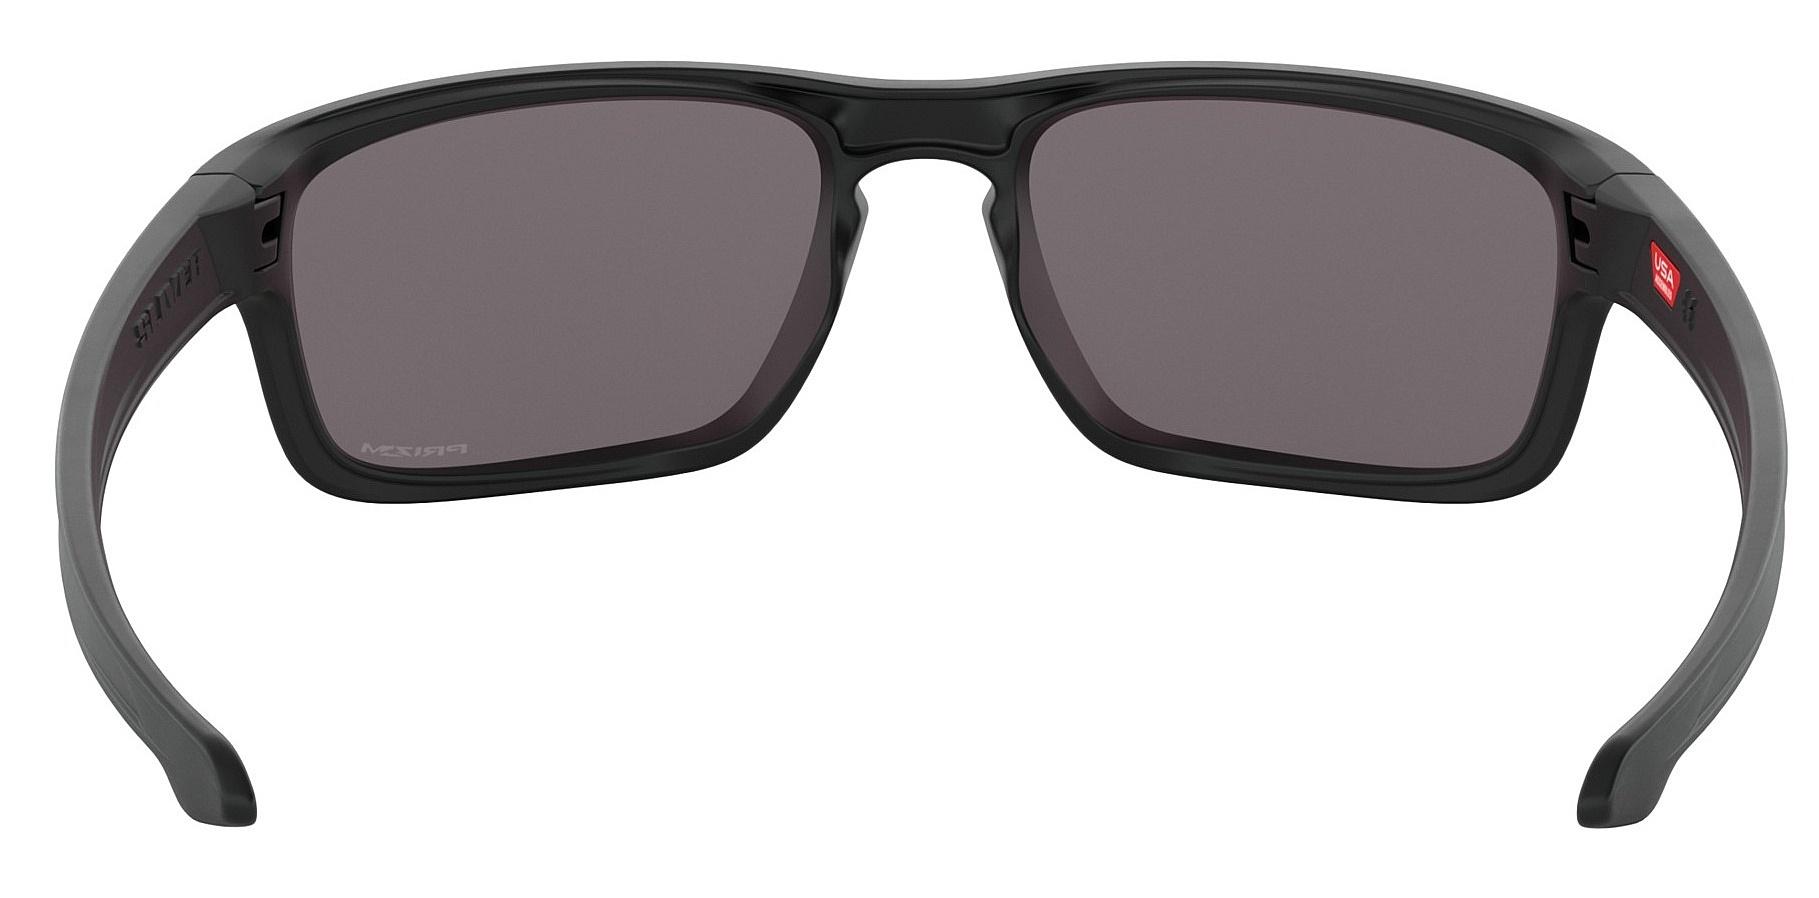 okuliare Oakley Sliver Stealth - Matte Black Prizm Gray - Snowboard ... 5b0bb0a6a1b